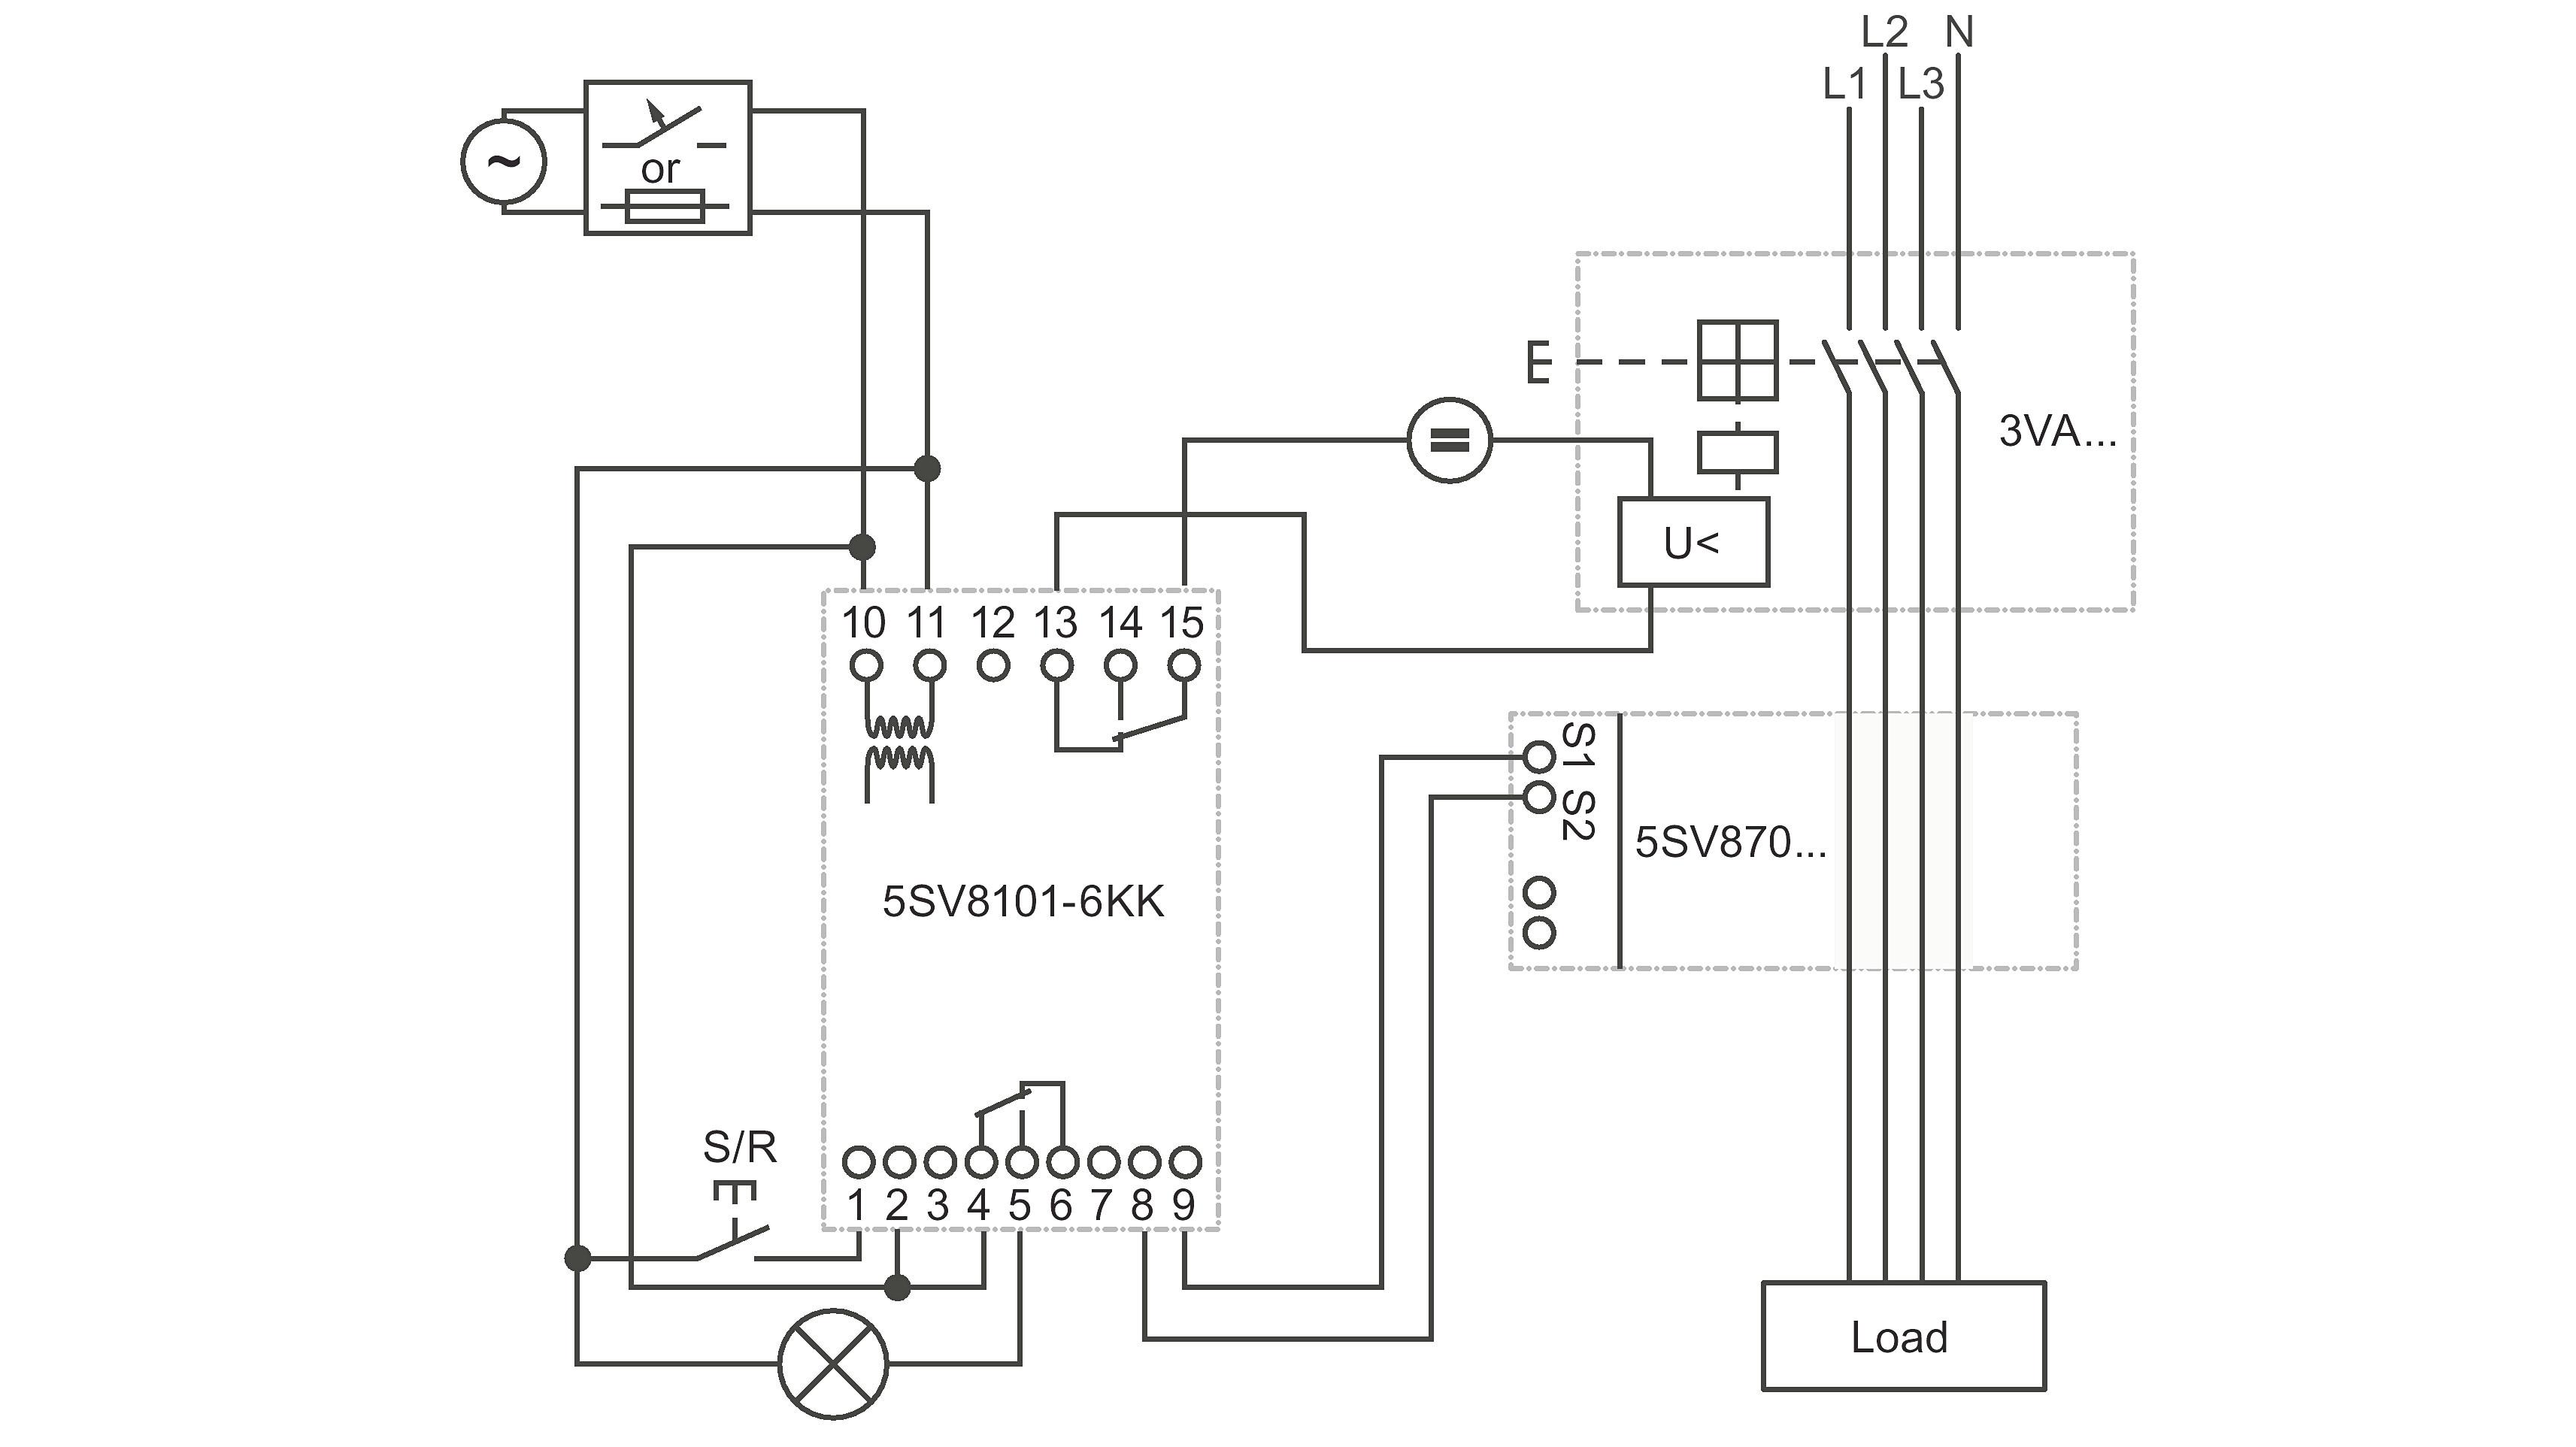 HR_7110] Eaton Shunt Trip Breaker Wiring Diagram With Push On